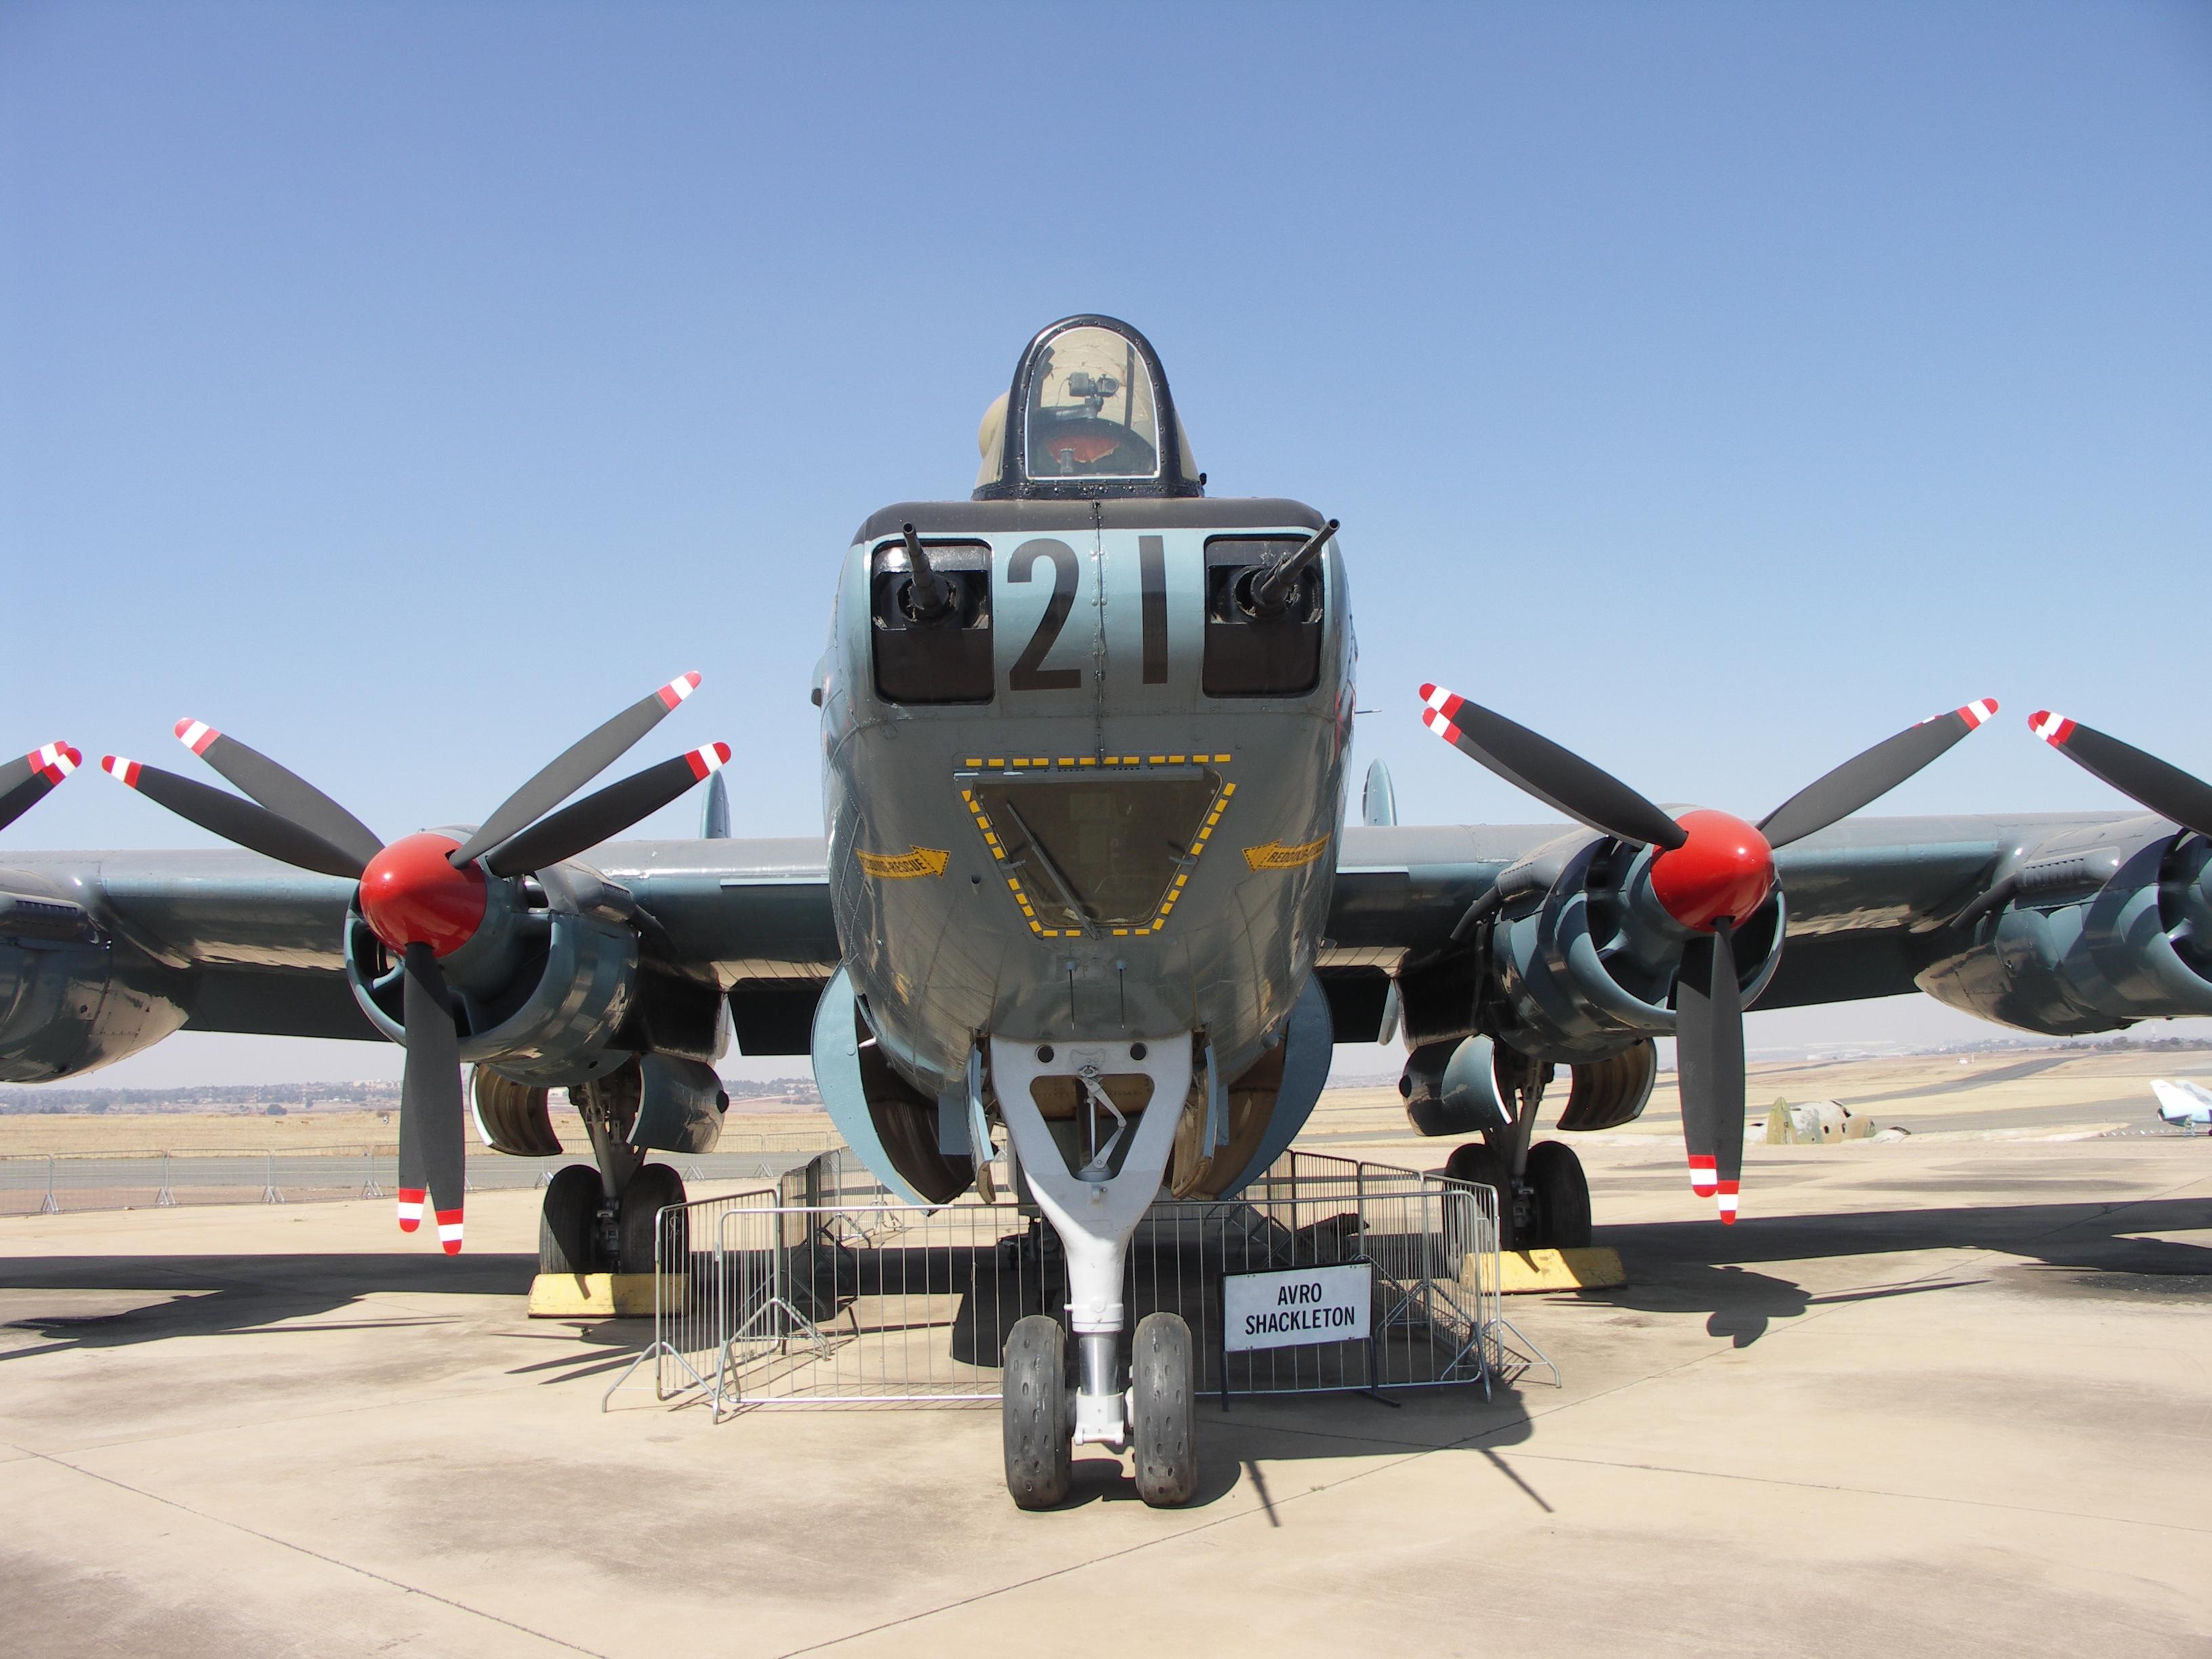 Airplanes royal air force avro shackleton wallpaper | (20805)